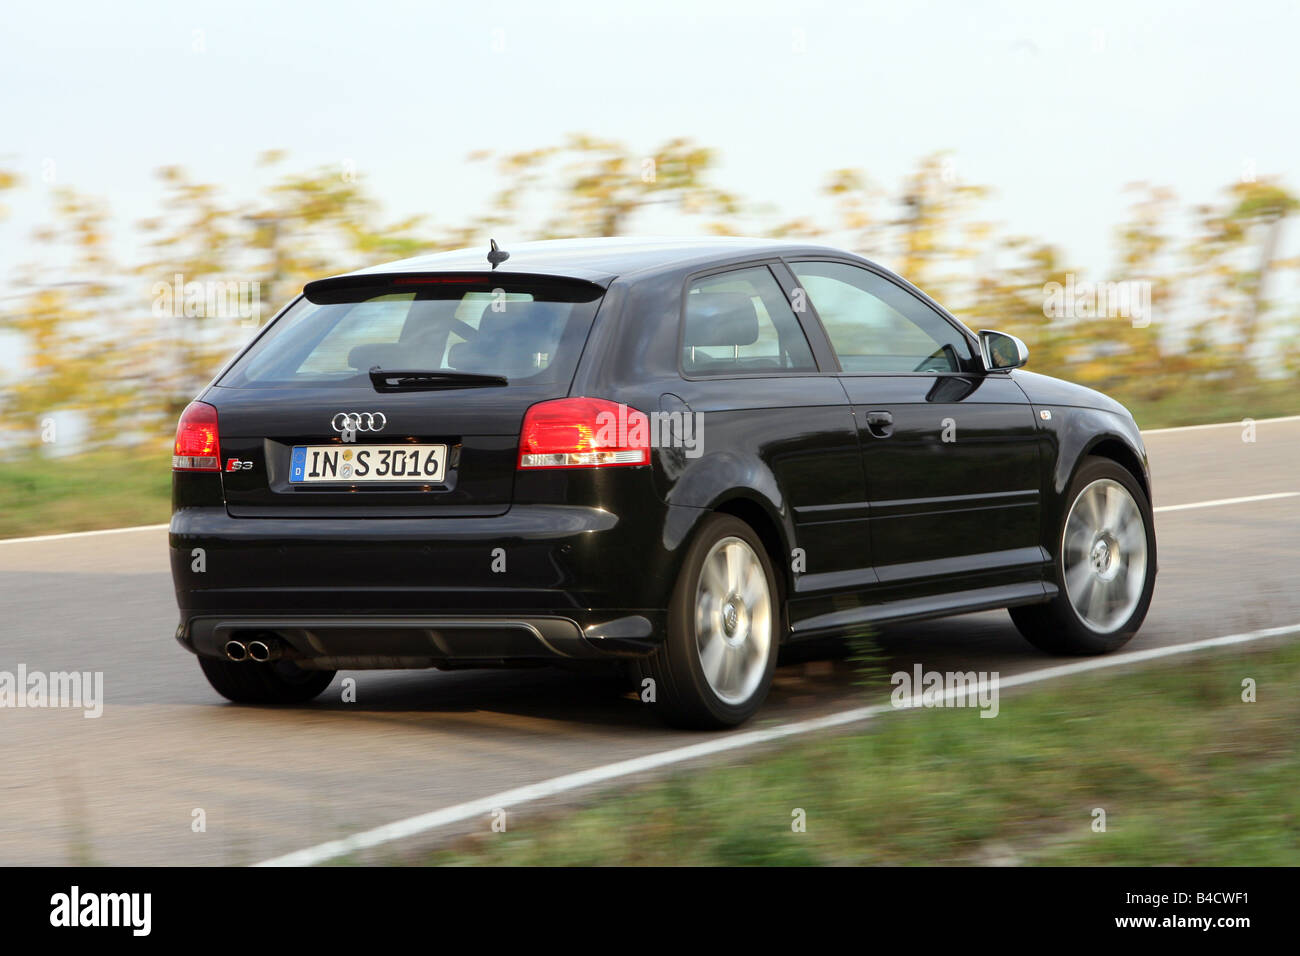 Kekurangan Audi S3 2006 Tangguh